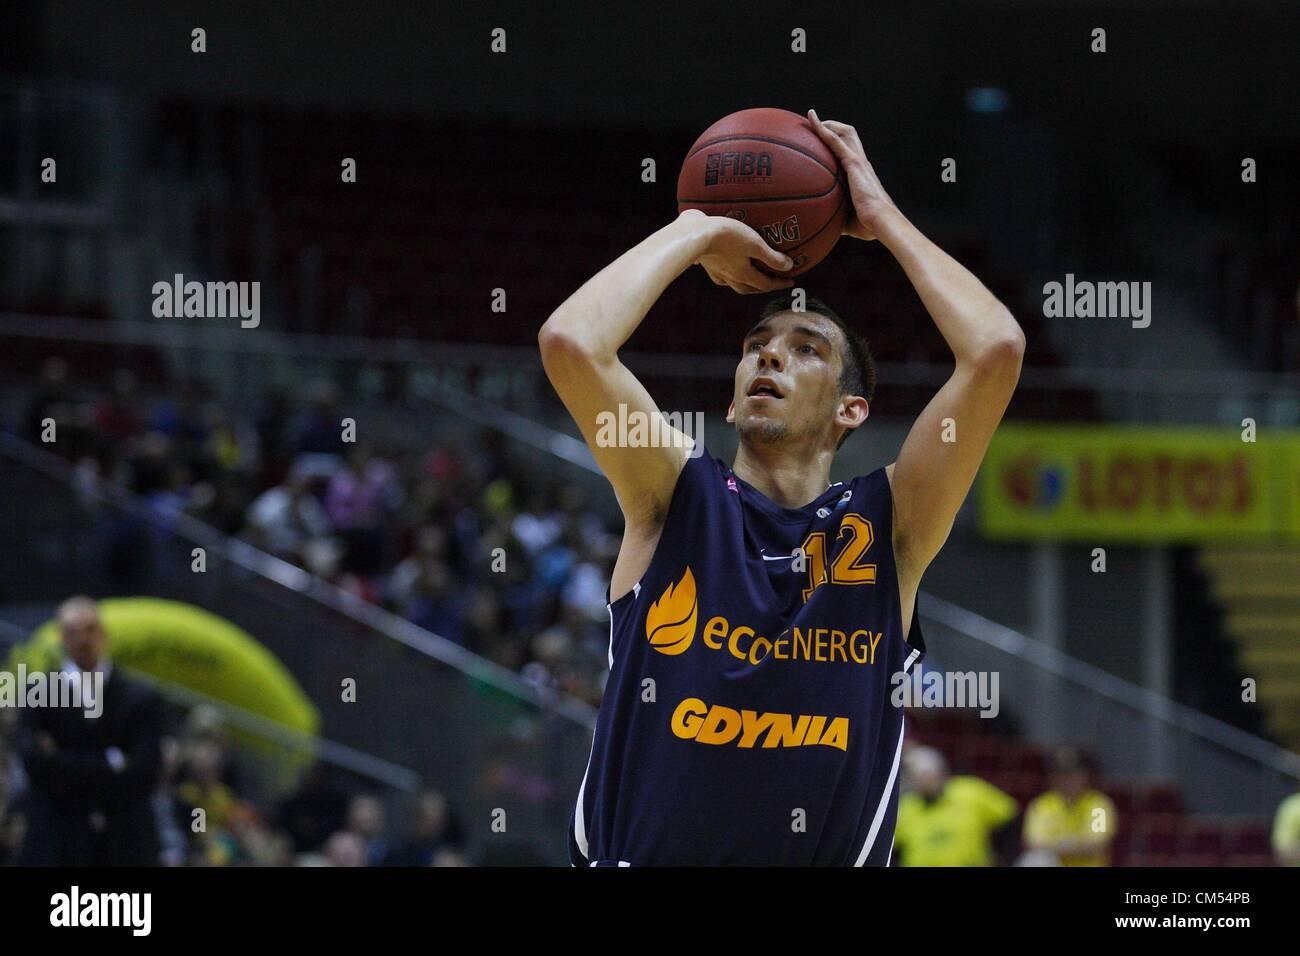 Sopot, Poland 6th, October 2012 Polish basketball extraleague - Tauron Basket Liga. Jaroslaw Mokros (12) in action - Stock Image